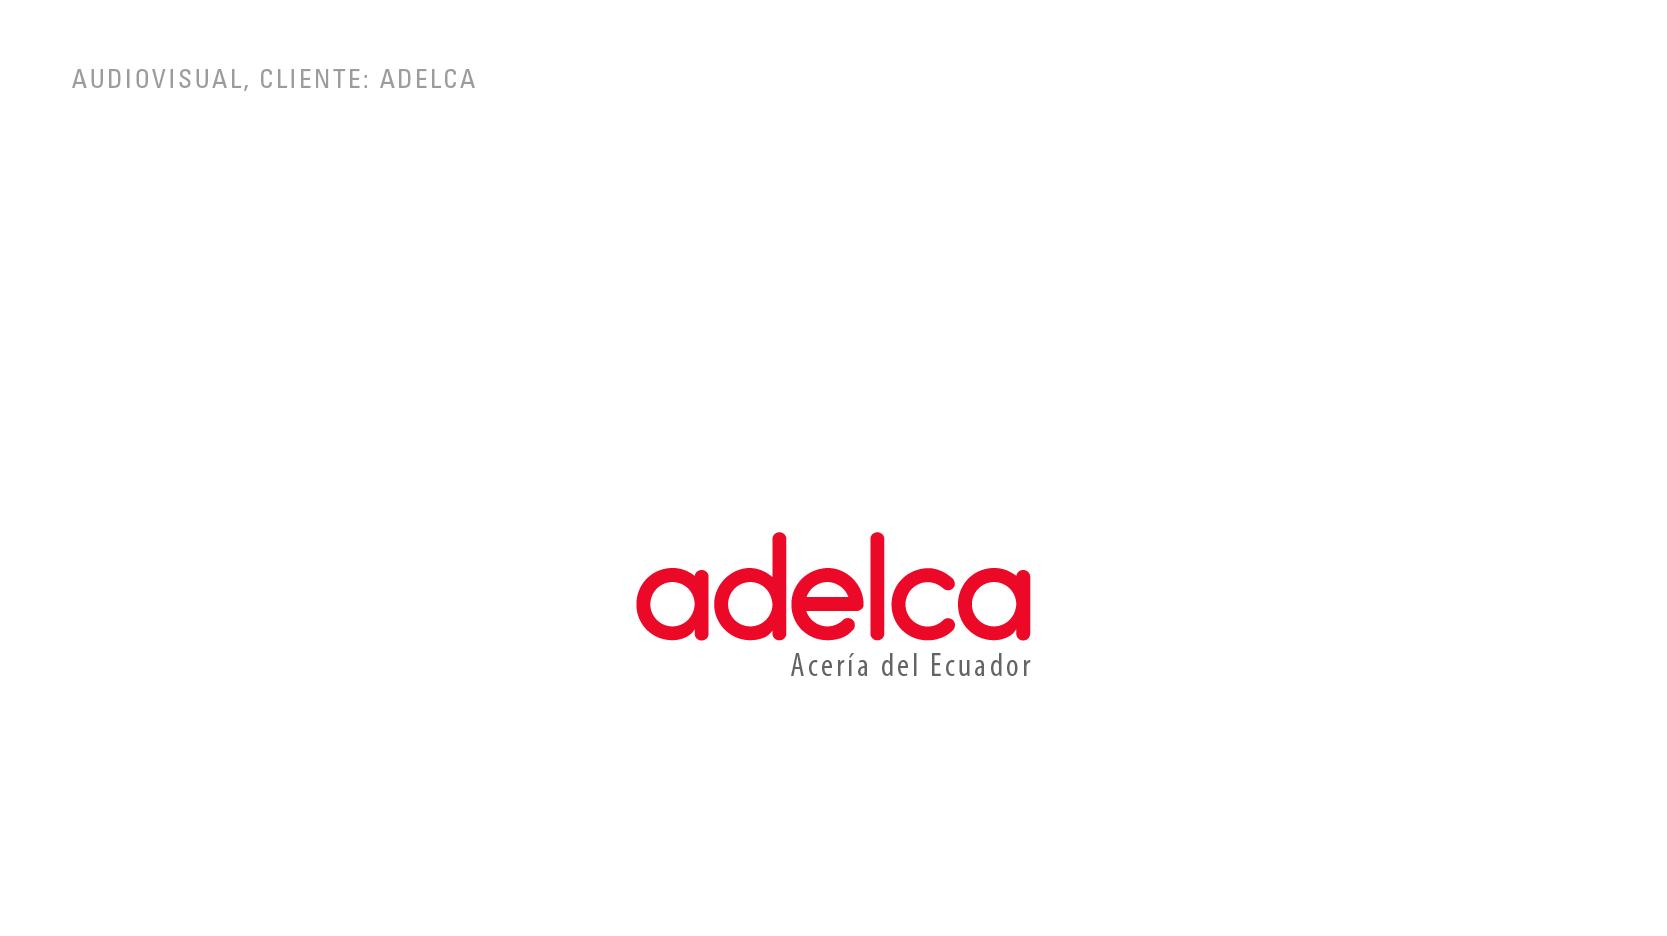 portafolio-adelca-1